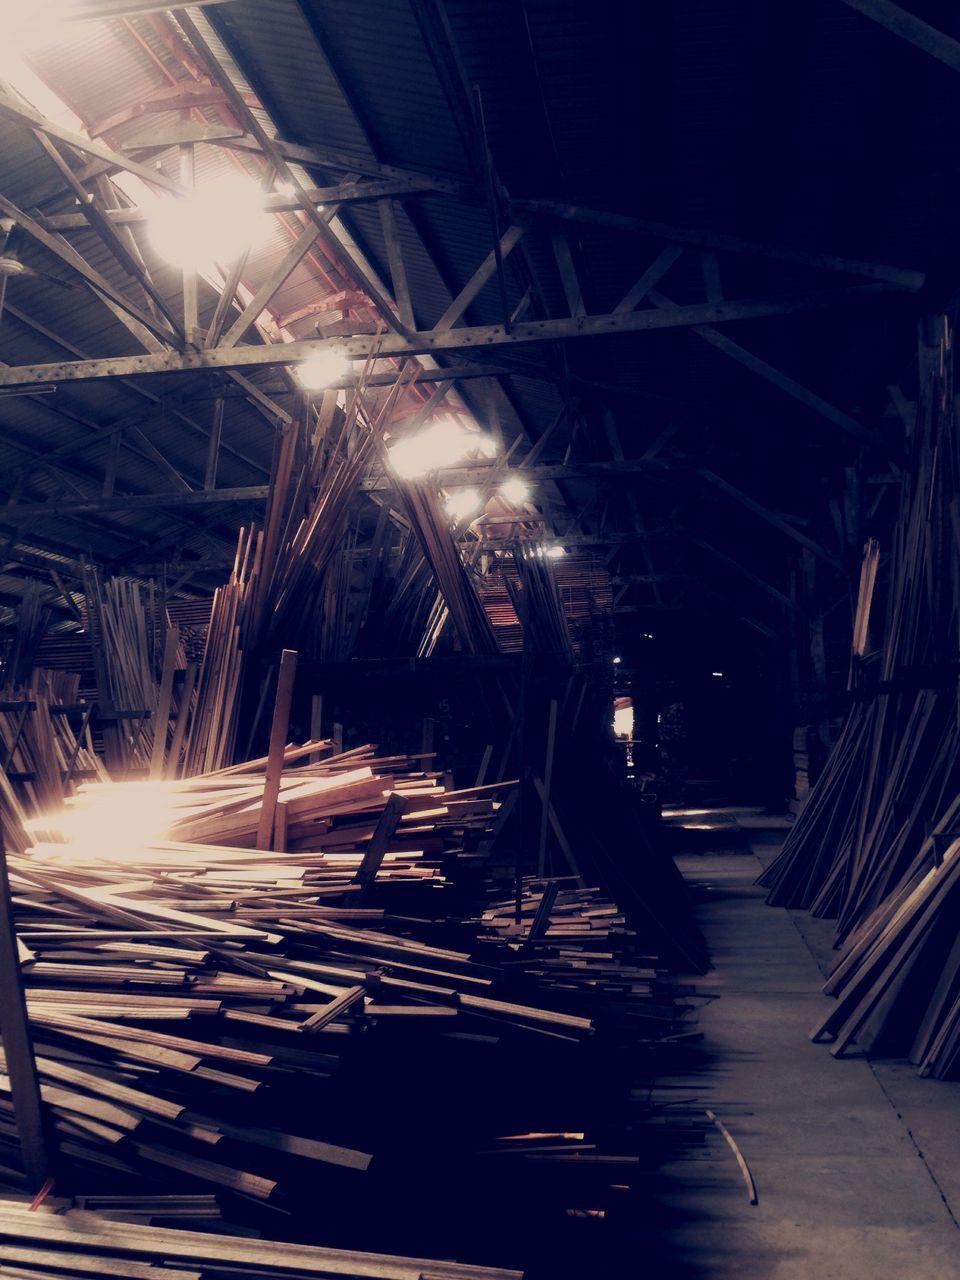 illuminated, indoors, night, lighting equipment, workshop, light beam, no people, metal industry, warehouse, industry, factory, occupation, technology